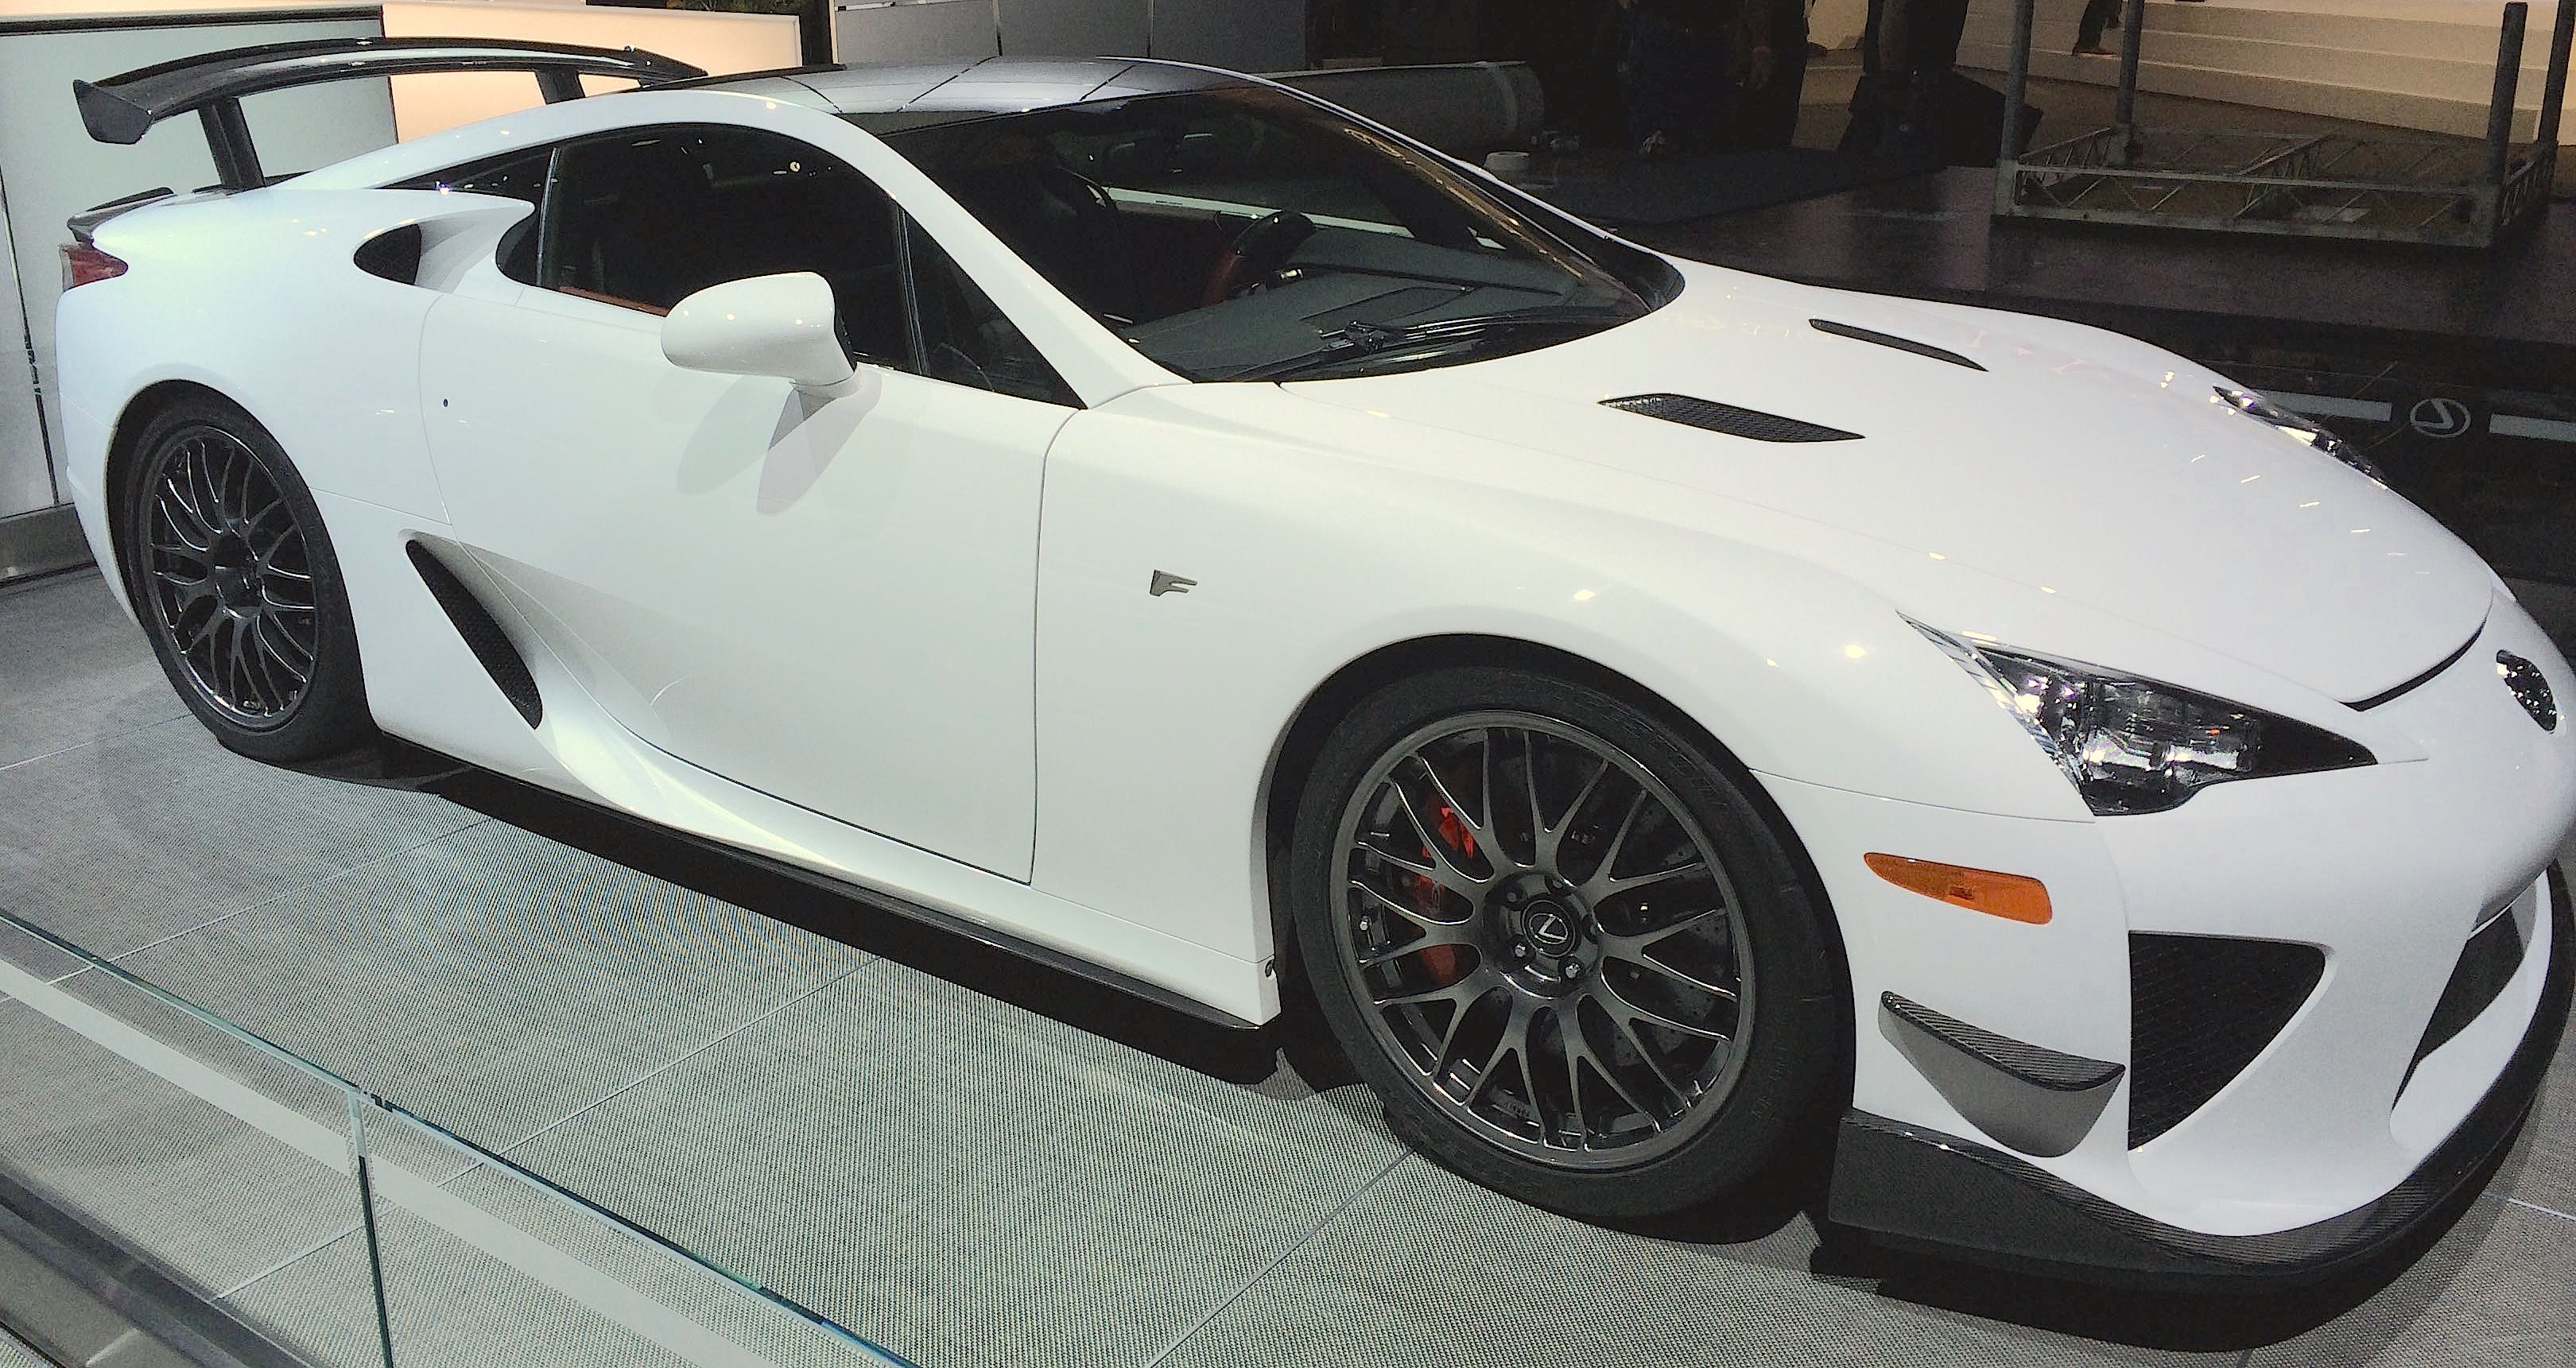 2014 Los Angeles Auto Show Part 4 – Lexus Mazda and Mercedes Benz